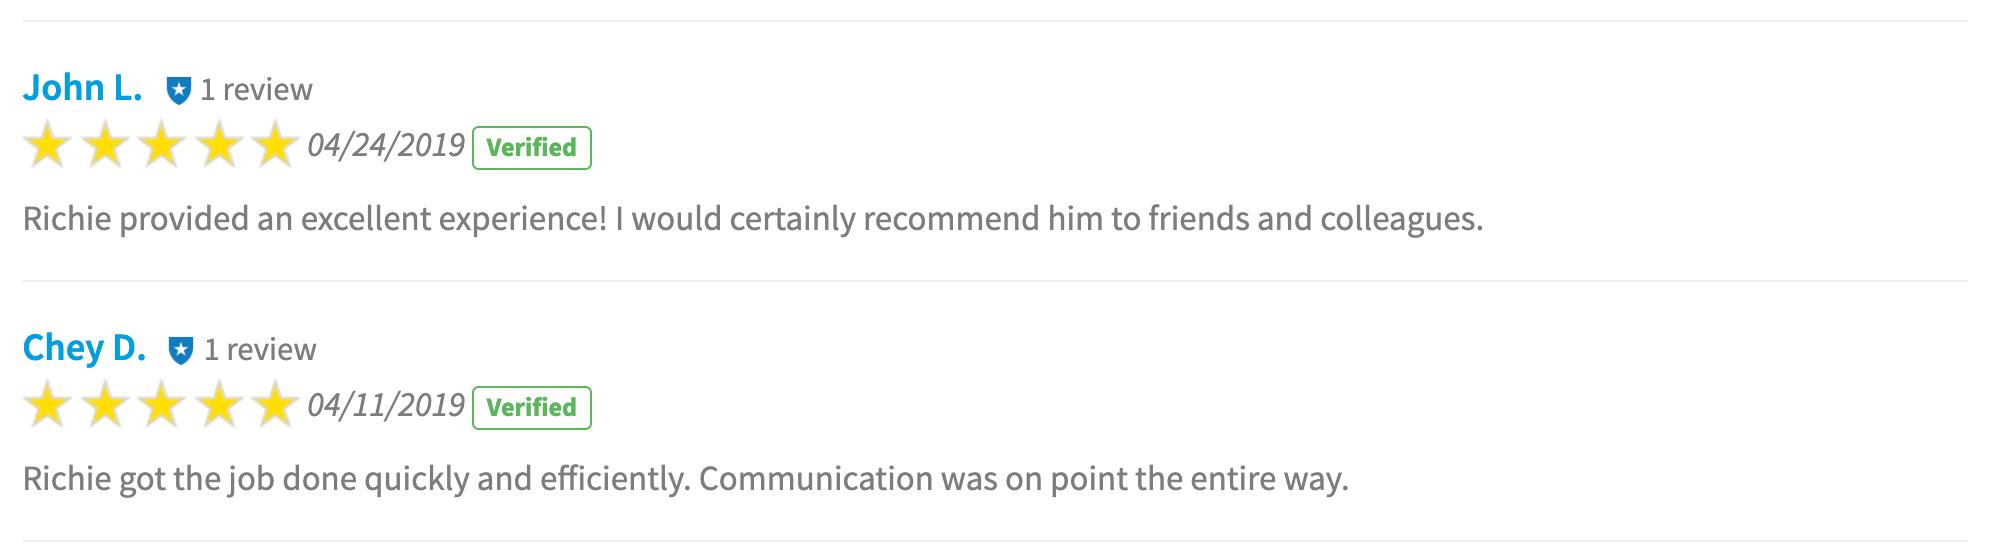 BuildBuyRefi.com reviews, Build Buy Refi reviews with 5 star rating for April and May 2019.